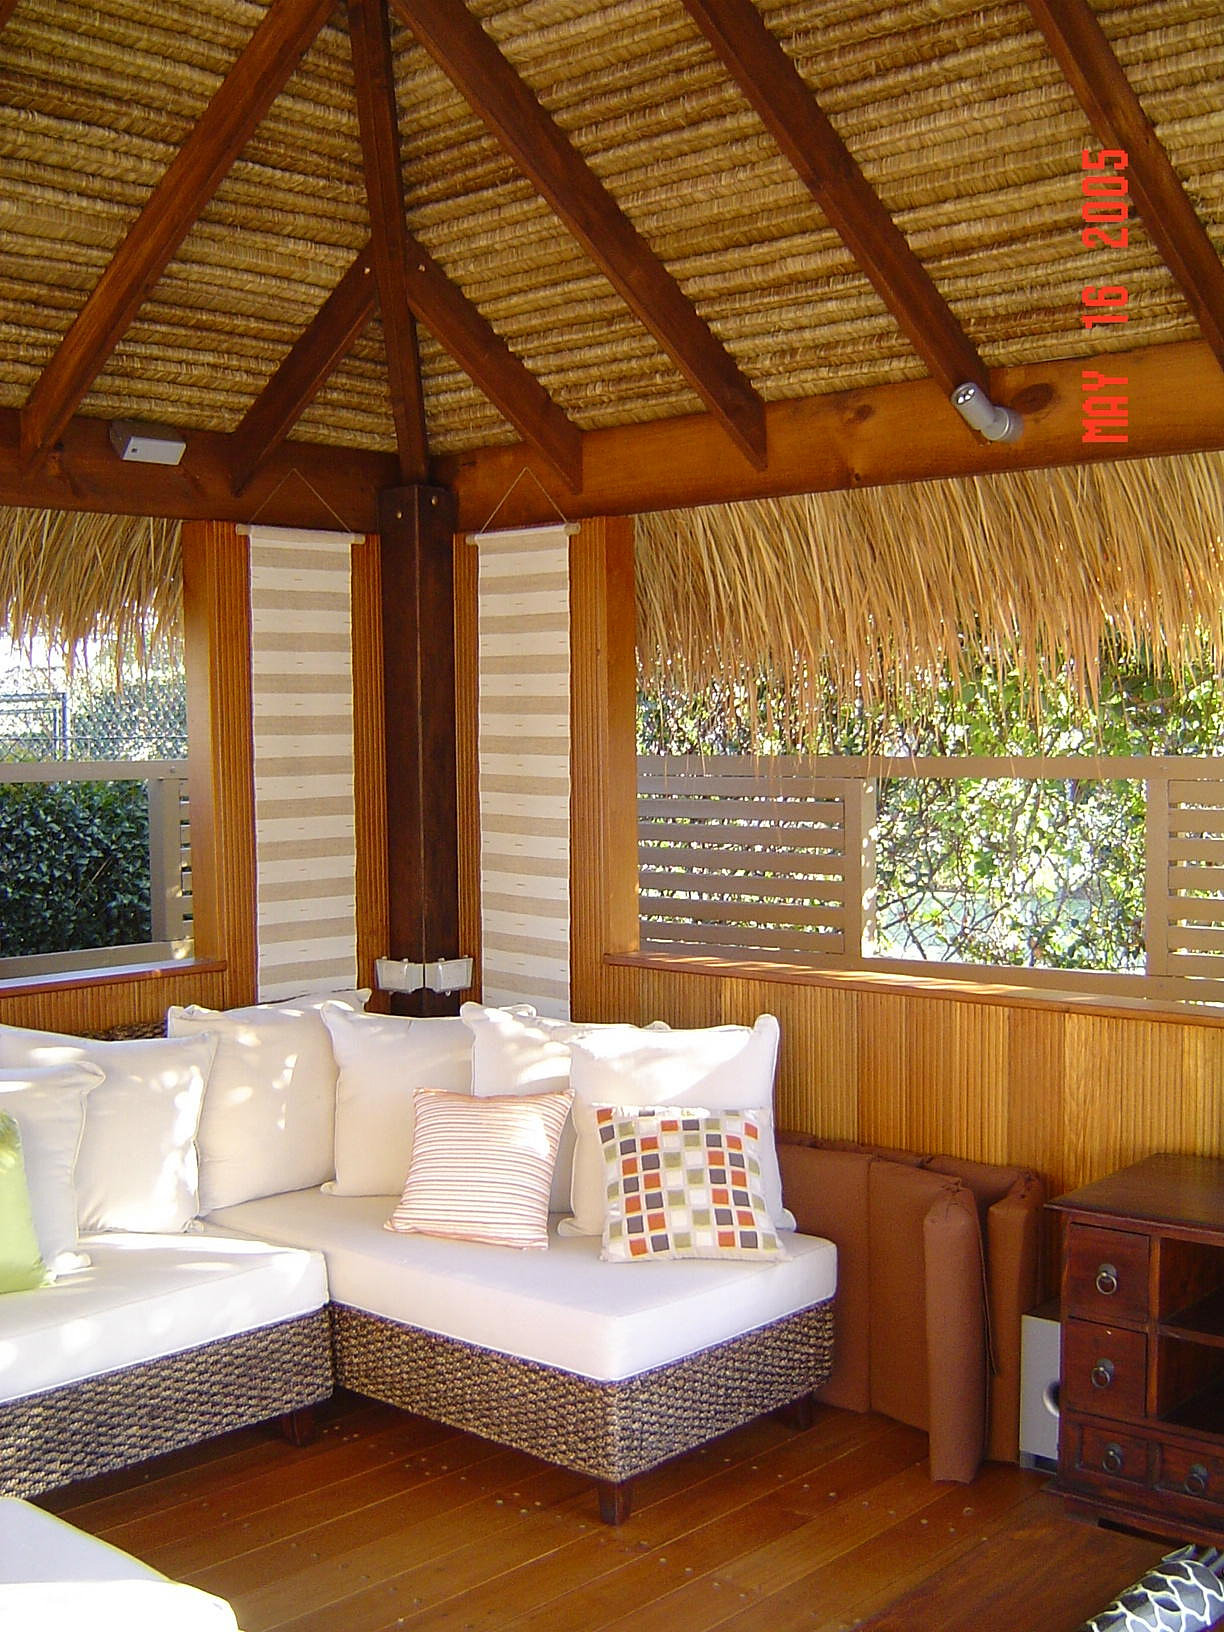 Pavillon 3 5x3 5 Wasserdicht Luxus Pavillon Gartenzelt Partyzelt Zelt Aus Metall Outsunny